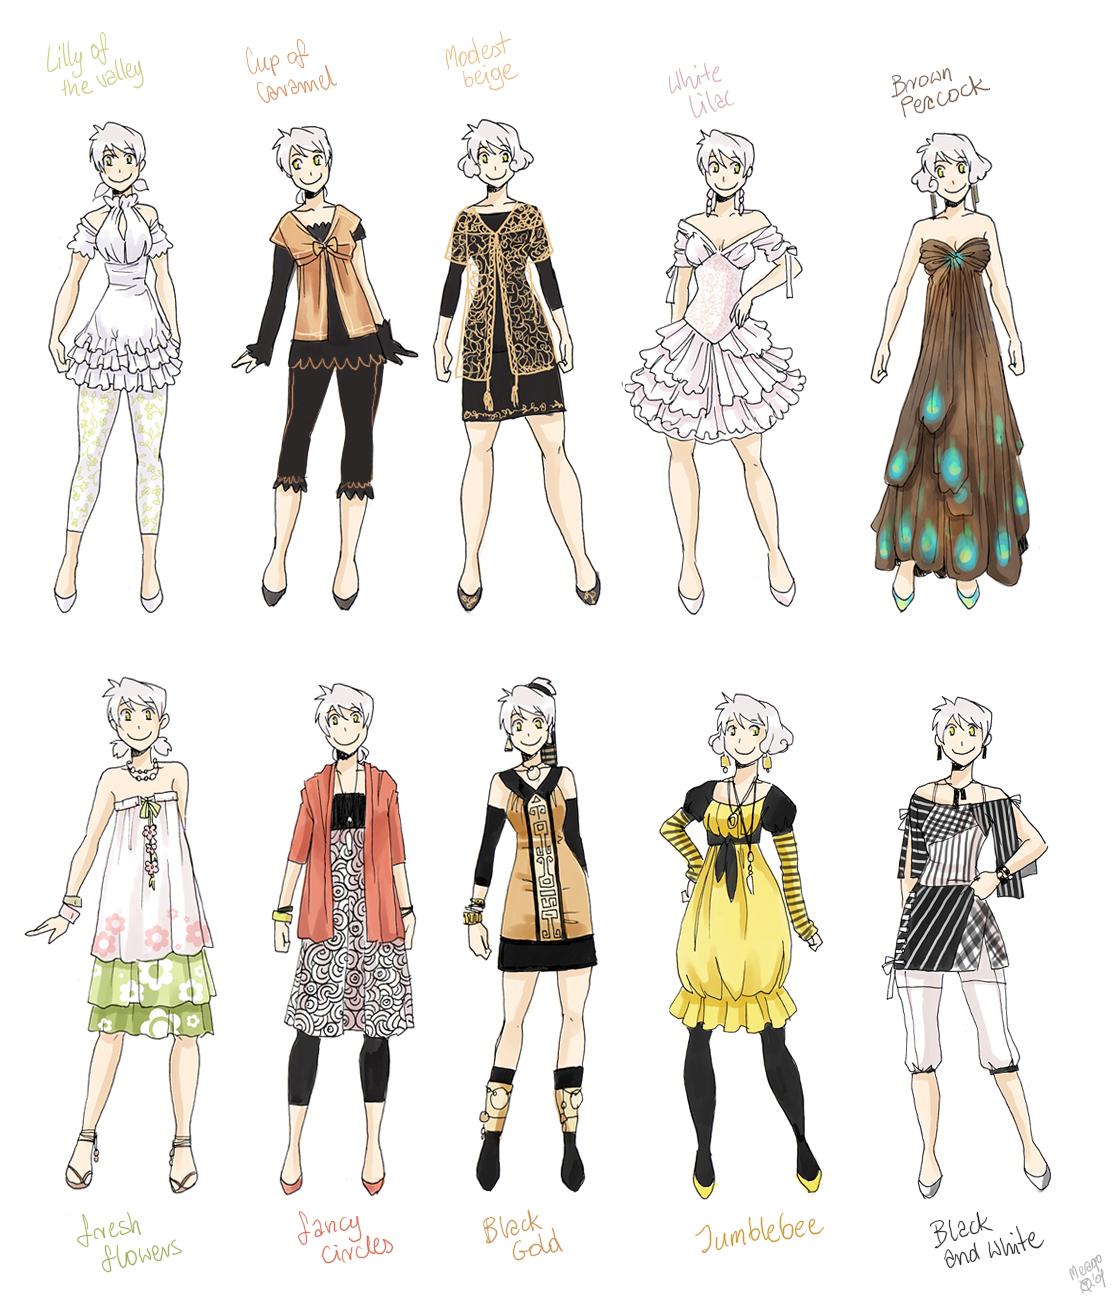 anime girl clothing styles